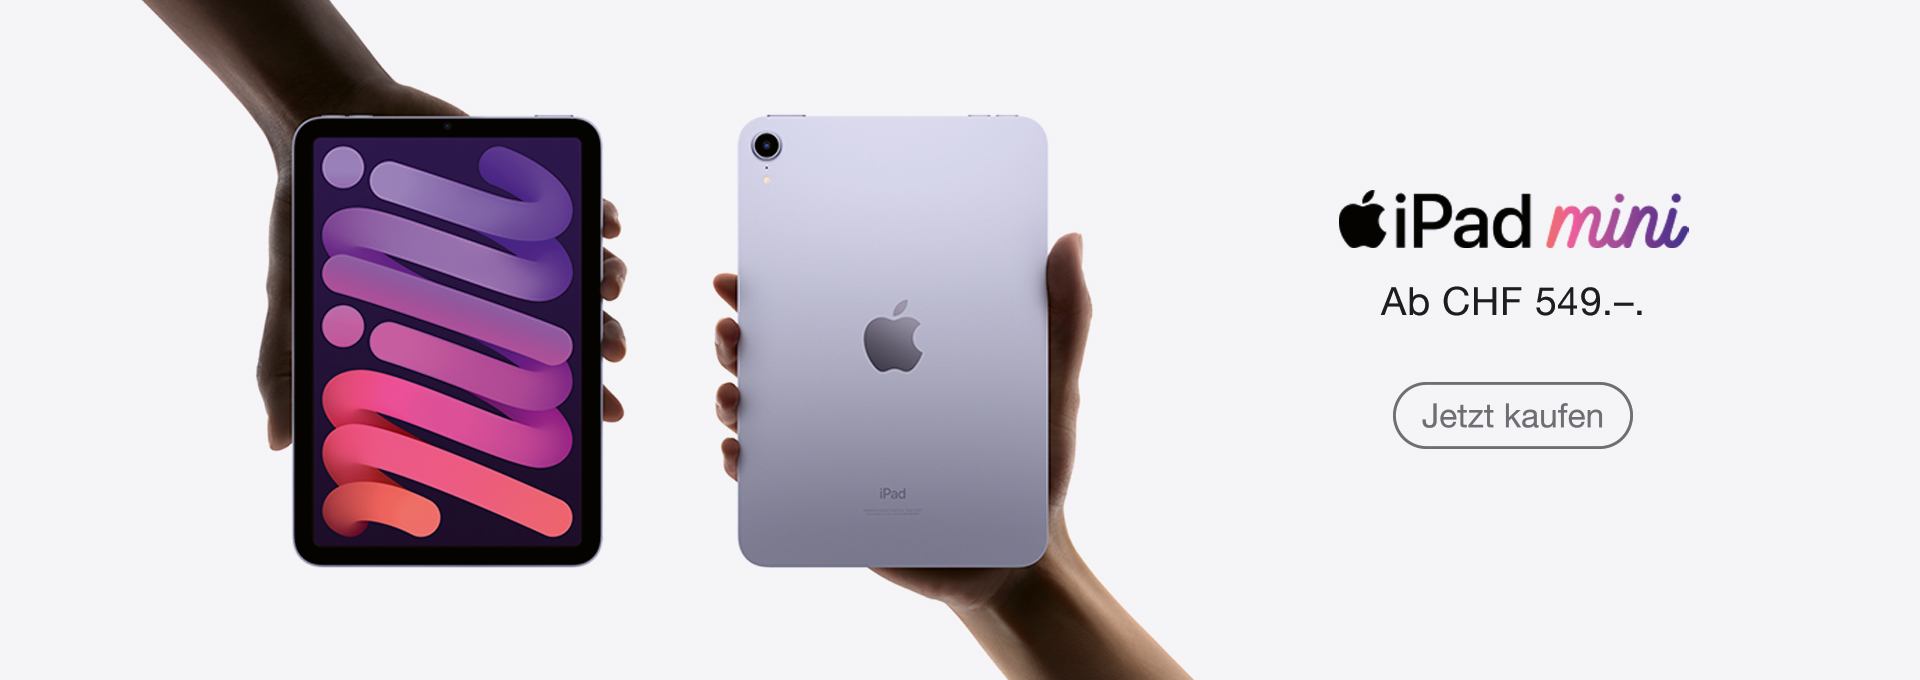 Jetzt iPad mini kaufen